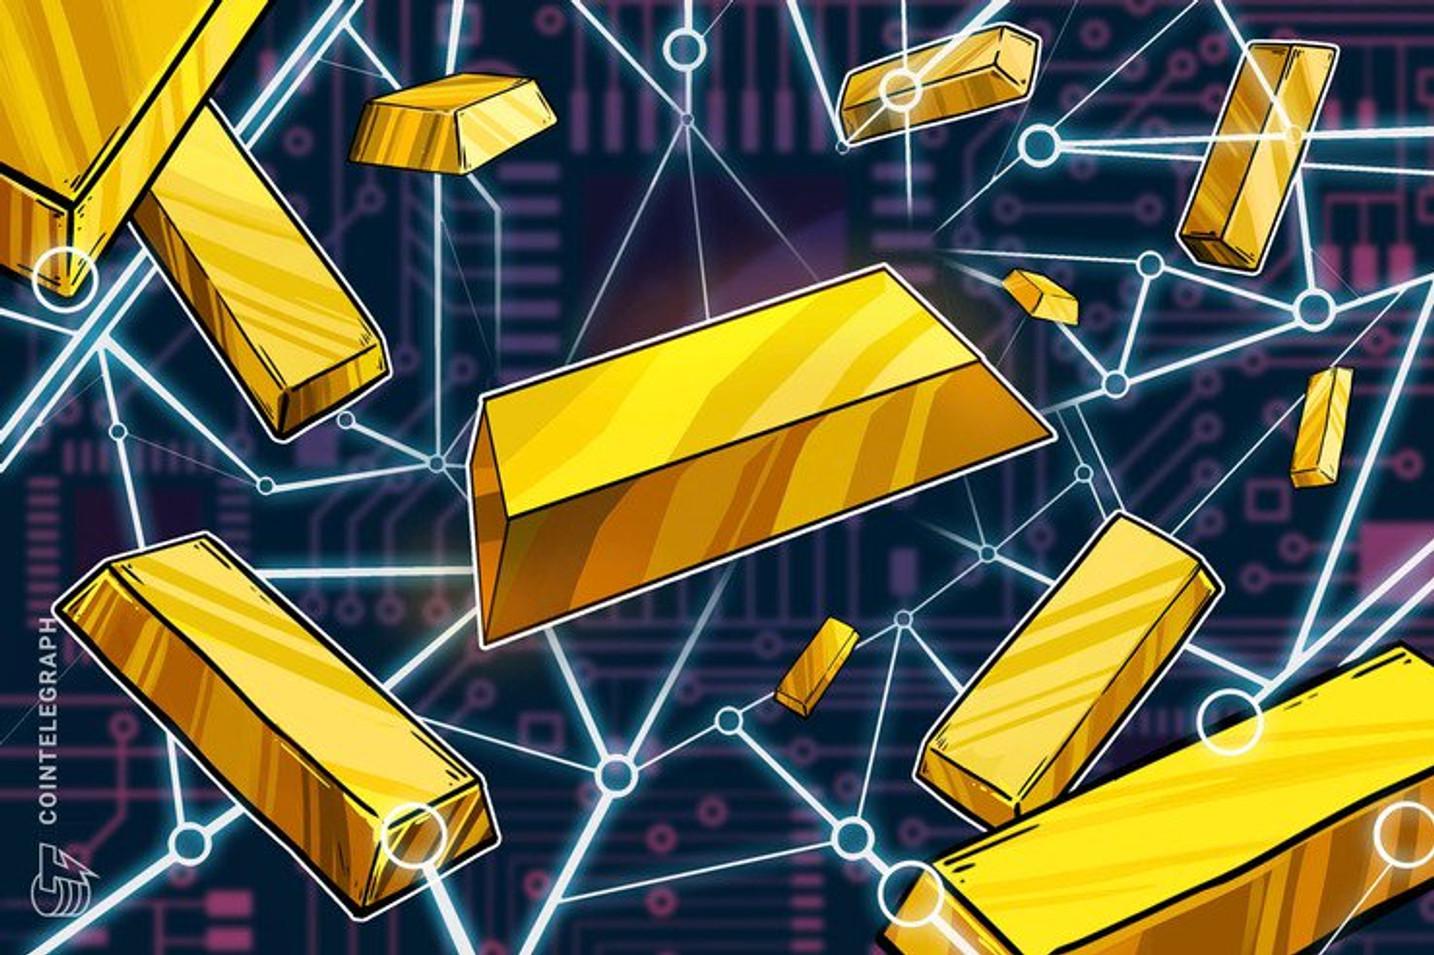 CEO da Grayscale Investments, Barry Silbert, diz que o Bitcoin faz tudo que o ouro costumava fazer